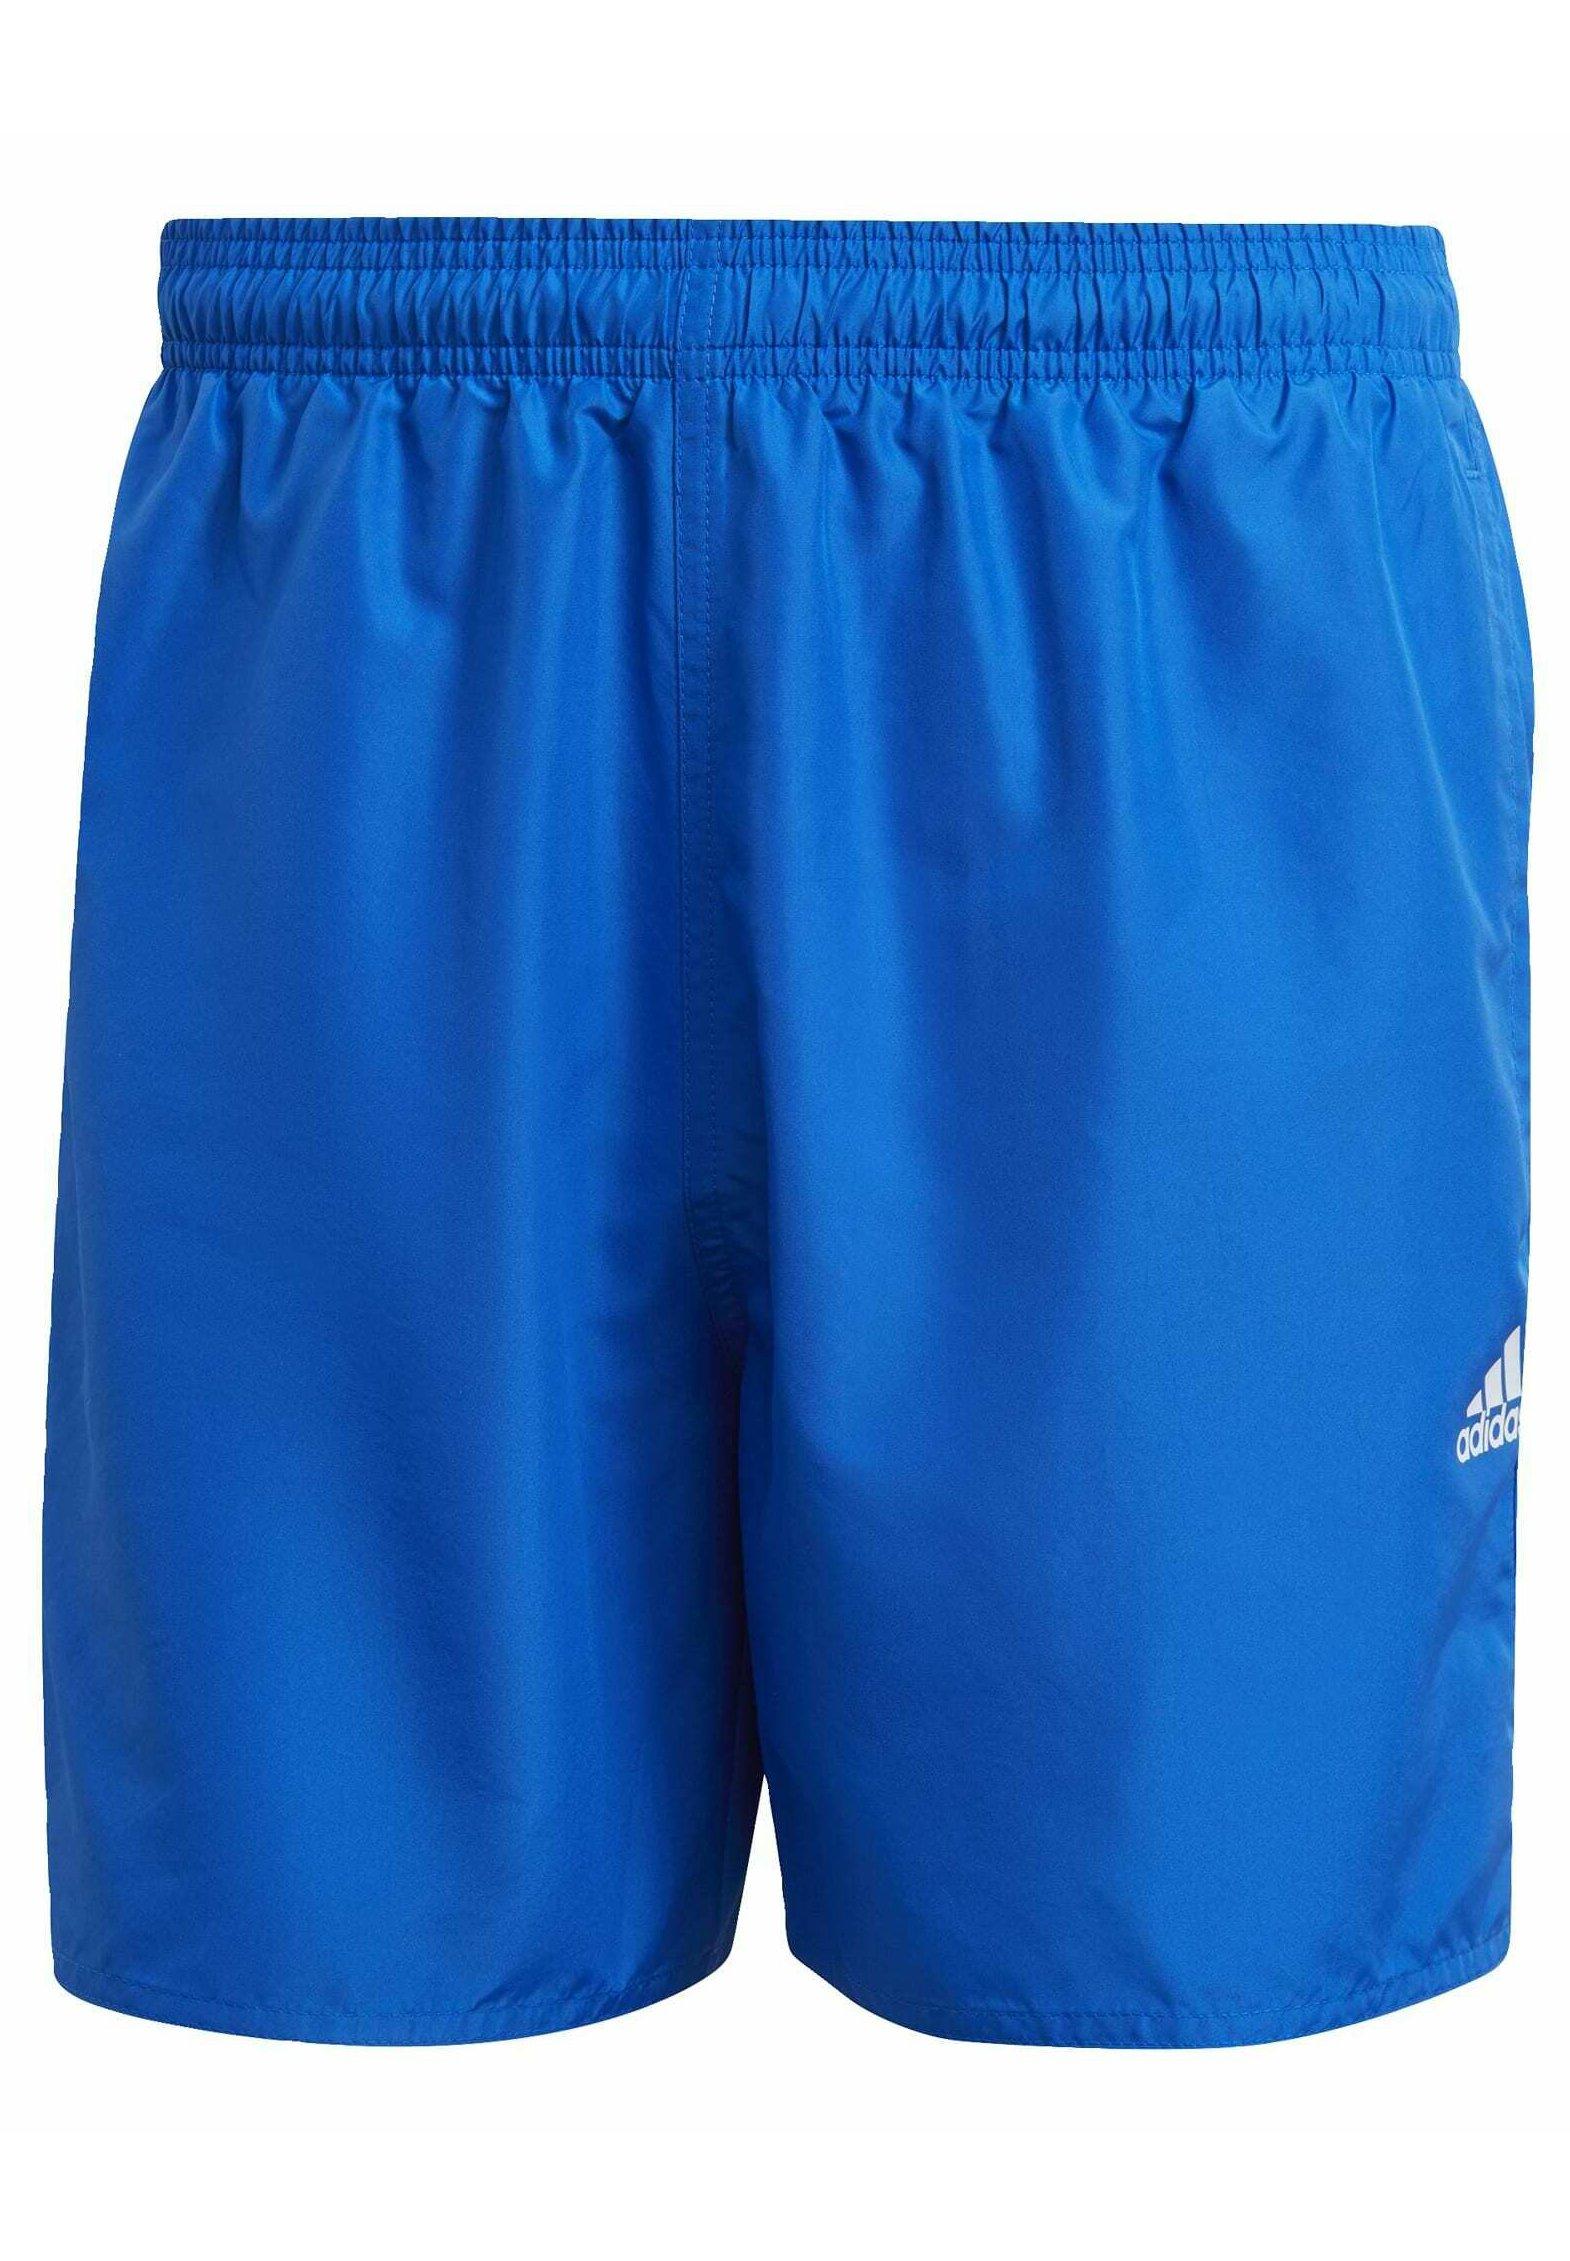 Men SOLID CLASSICS SL PRIMEGREENSWIM SHORTS - Swimming shorts